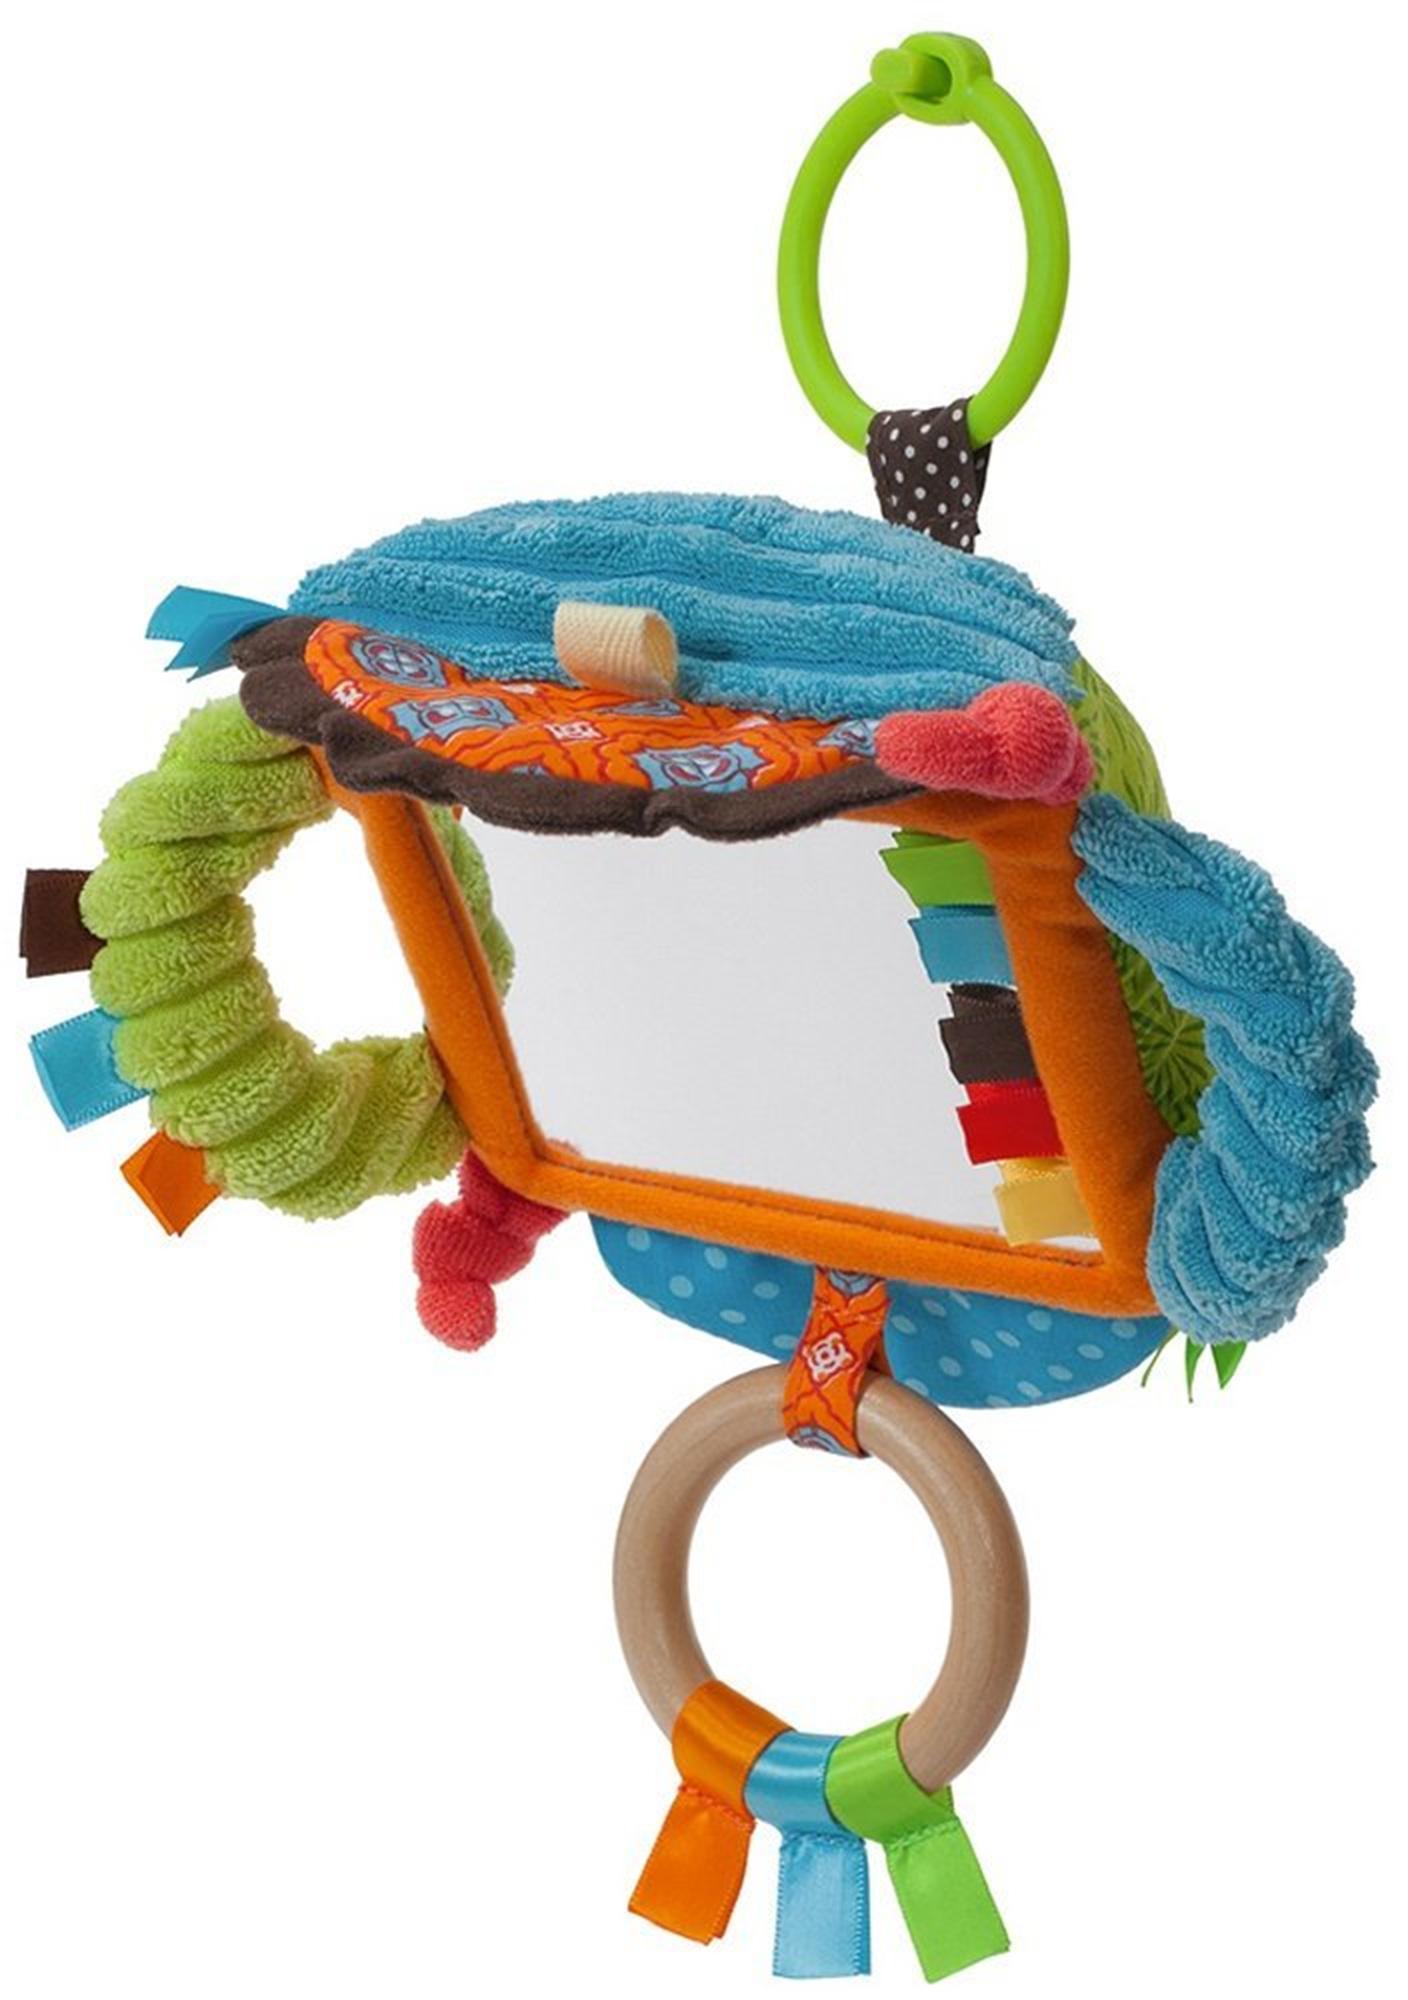 infantino go gaga mirror baby toddler clip on pram carseat cot toy gift bnip ebay. Black Bedroom Furniture Sets. Home Design Ideas